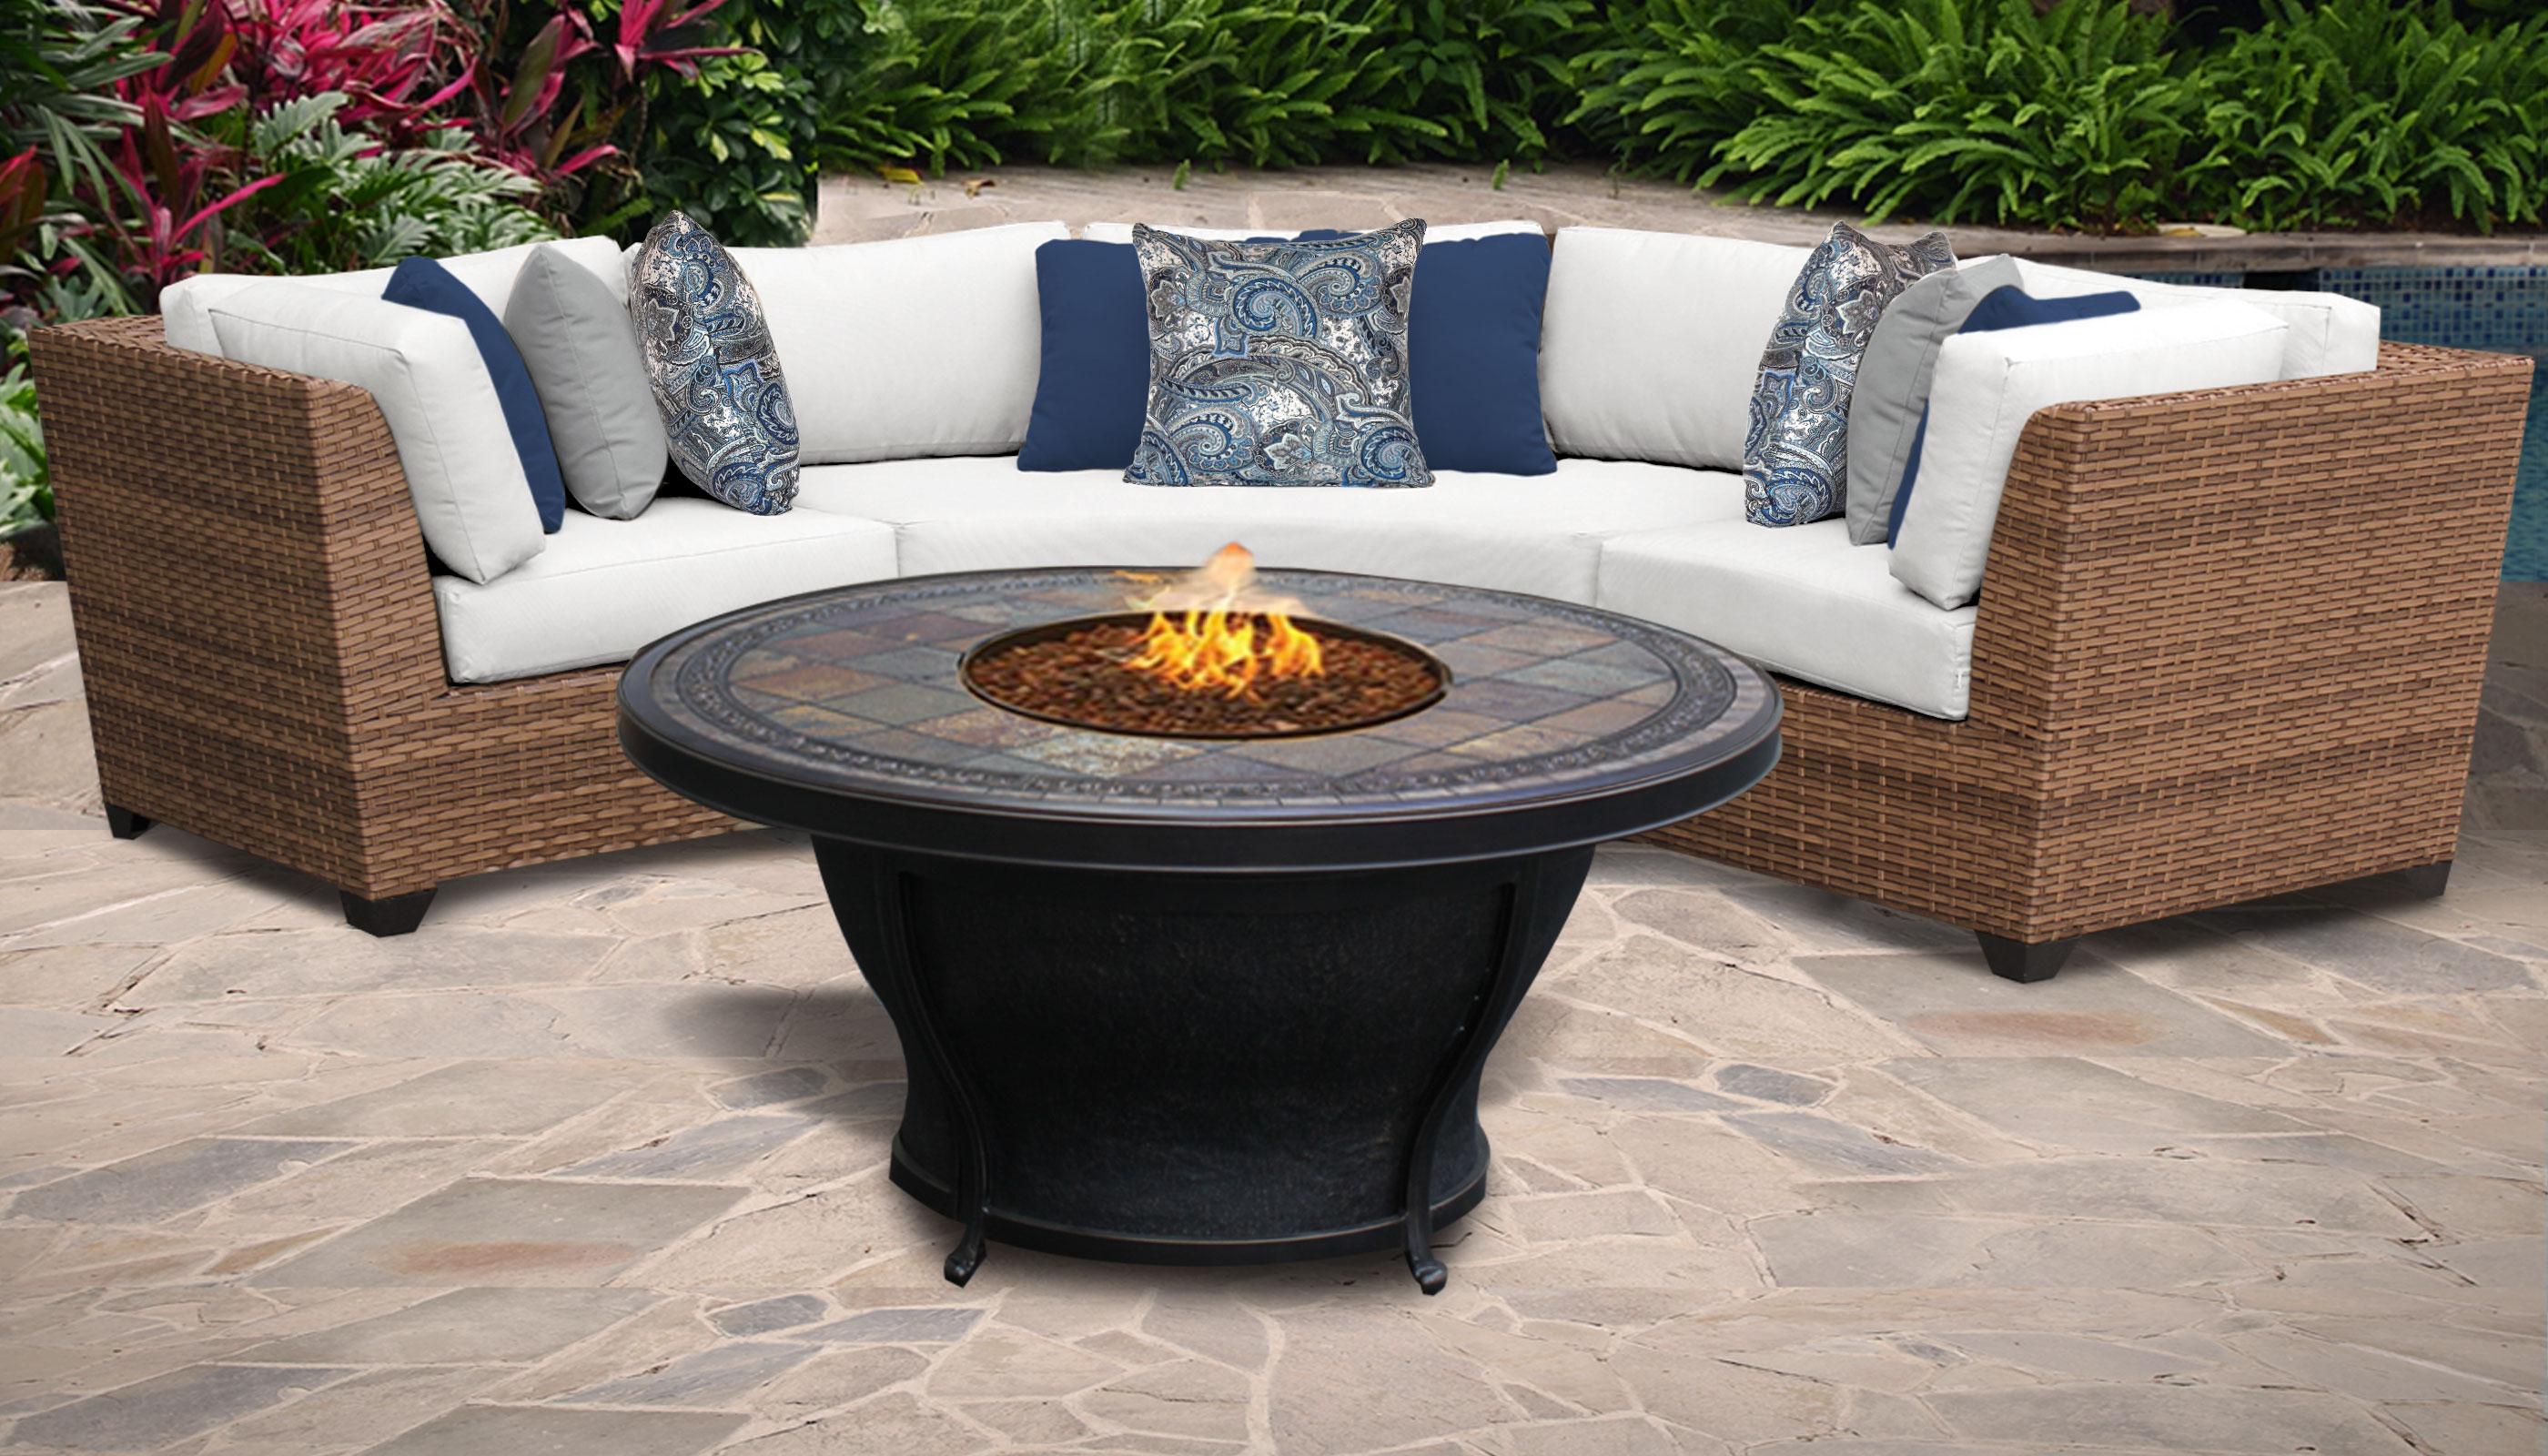 Laguna 4 Piece Outdoor Wicker Patio Furniture Set 04d